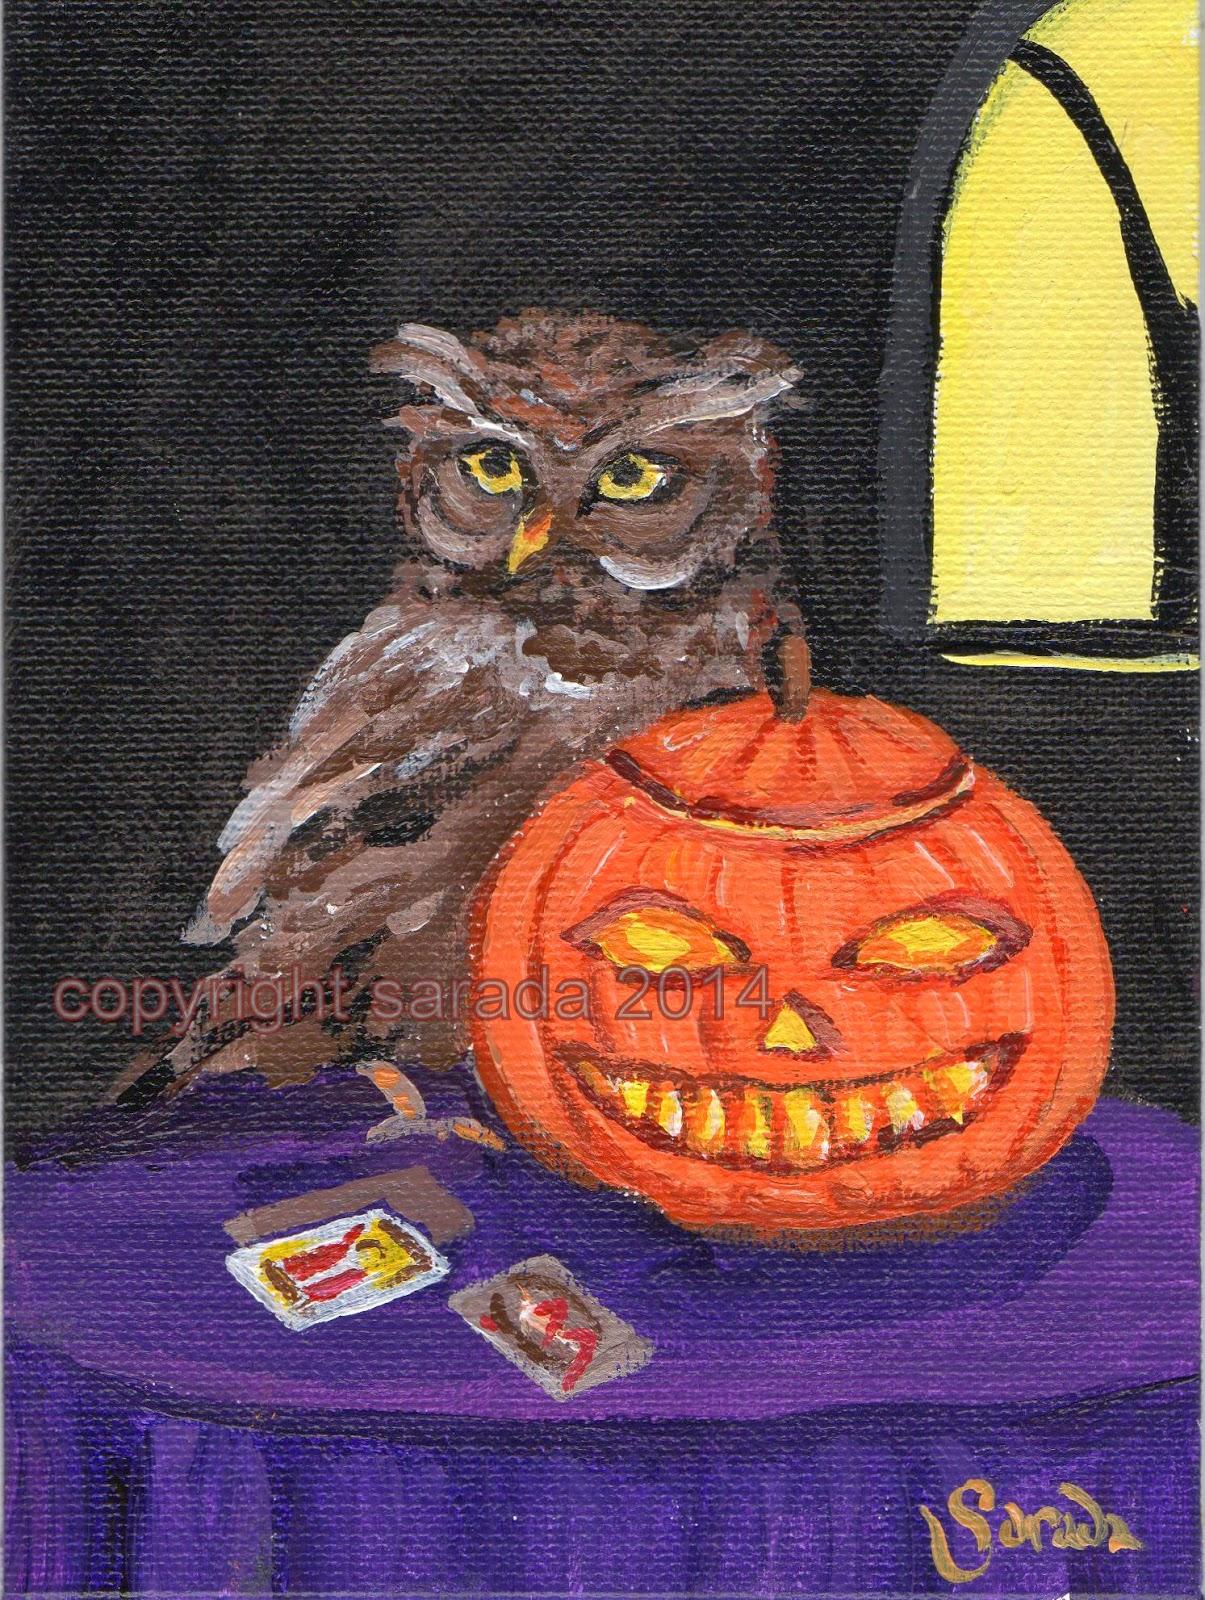 https://www.etsy.com/listing/205016448/halloween-tarot-owl-with-jack-o-lantern?ref=shop_home_active_12